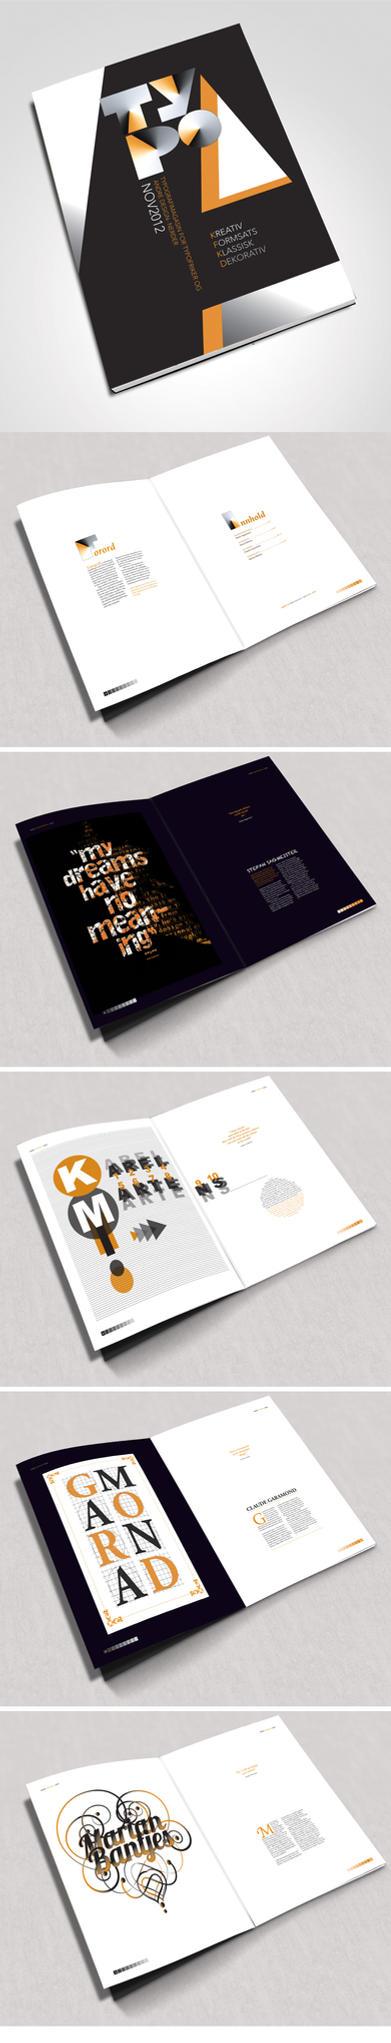 Typo Magazine by eclipse79